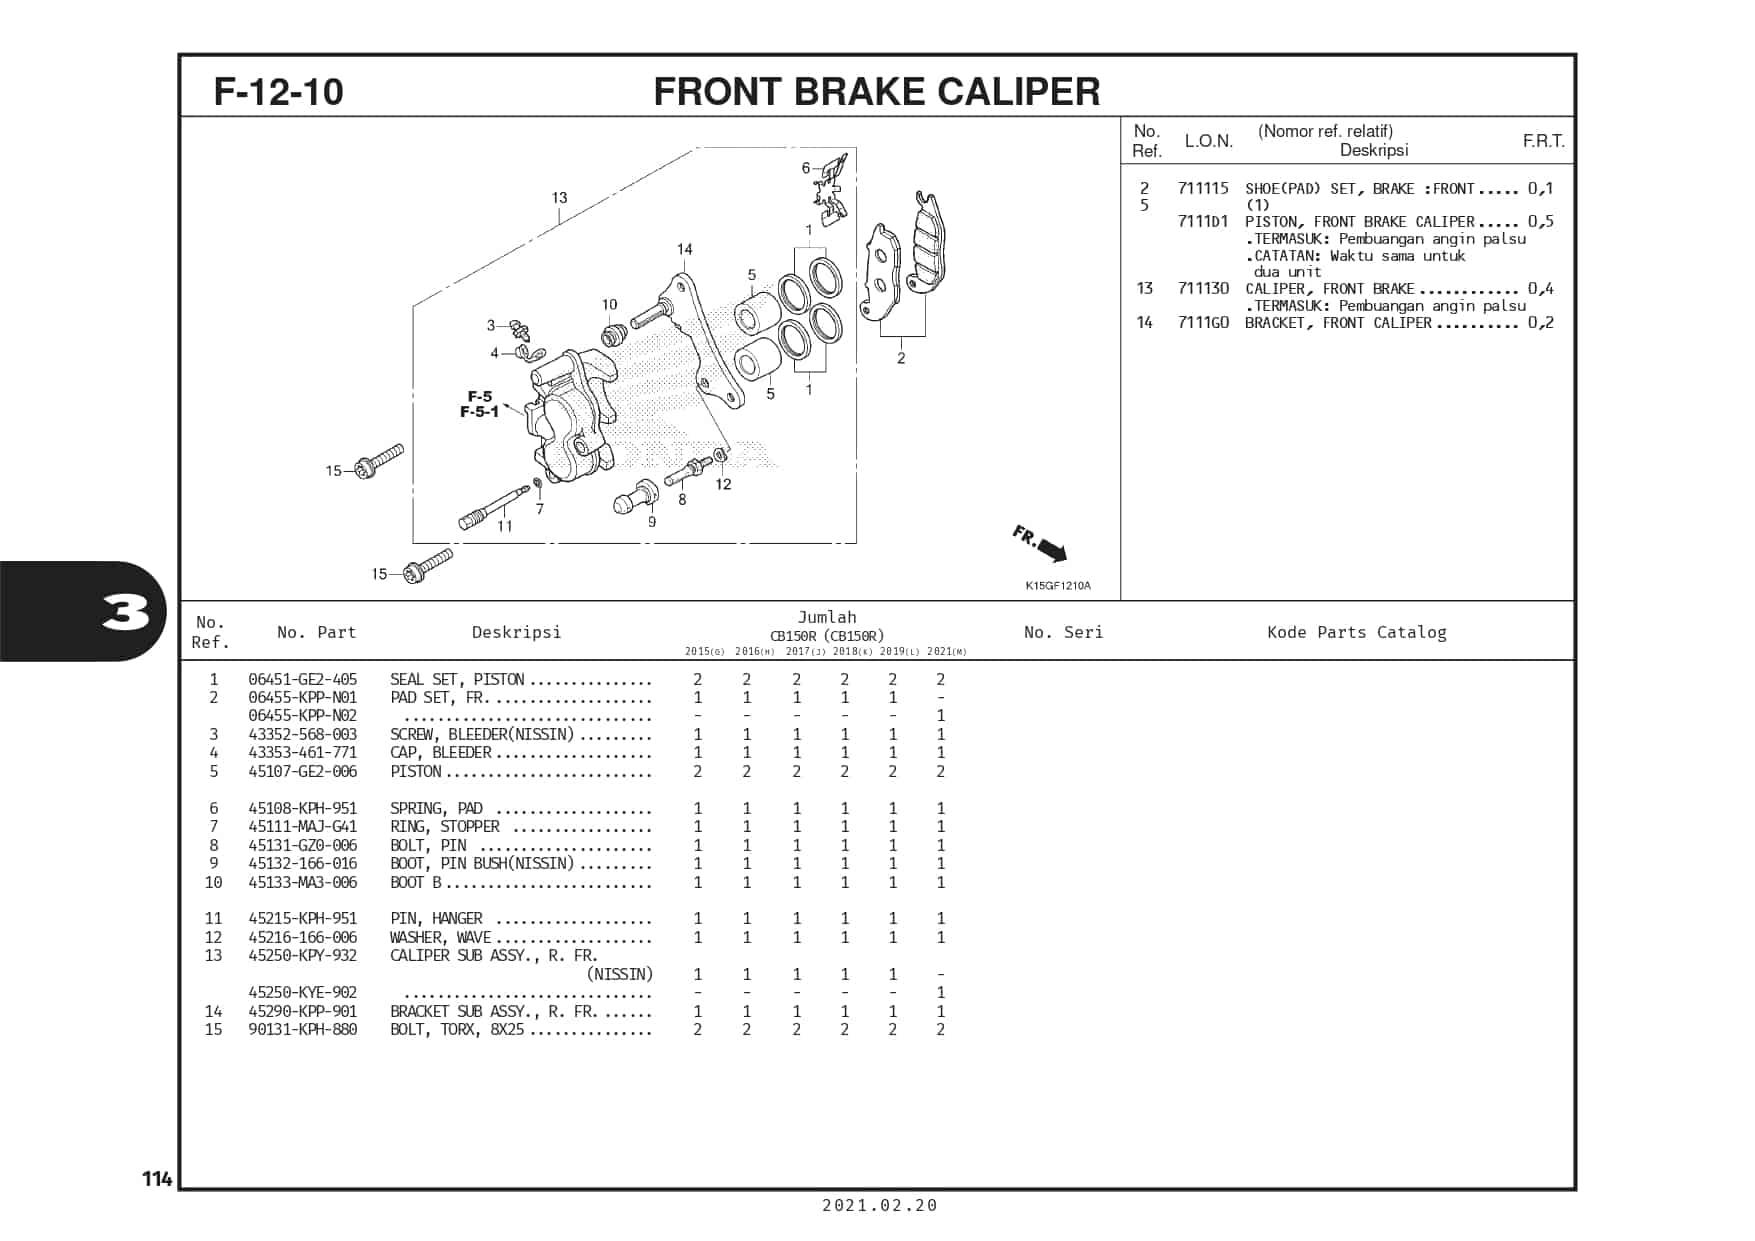 F-12-10 Front Brake Caliper